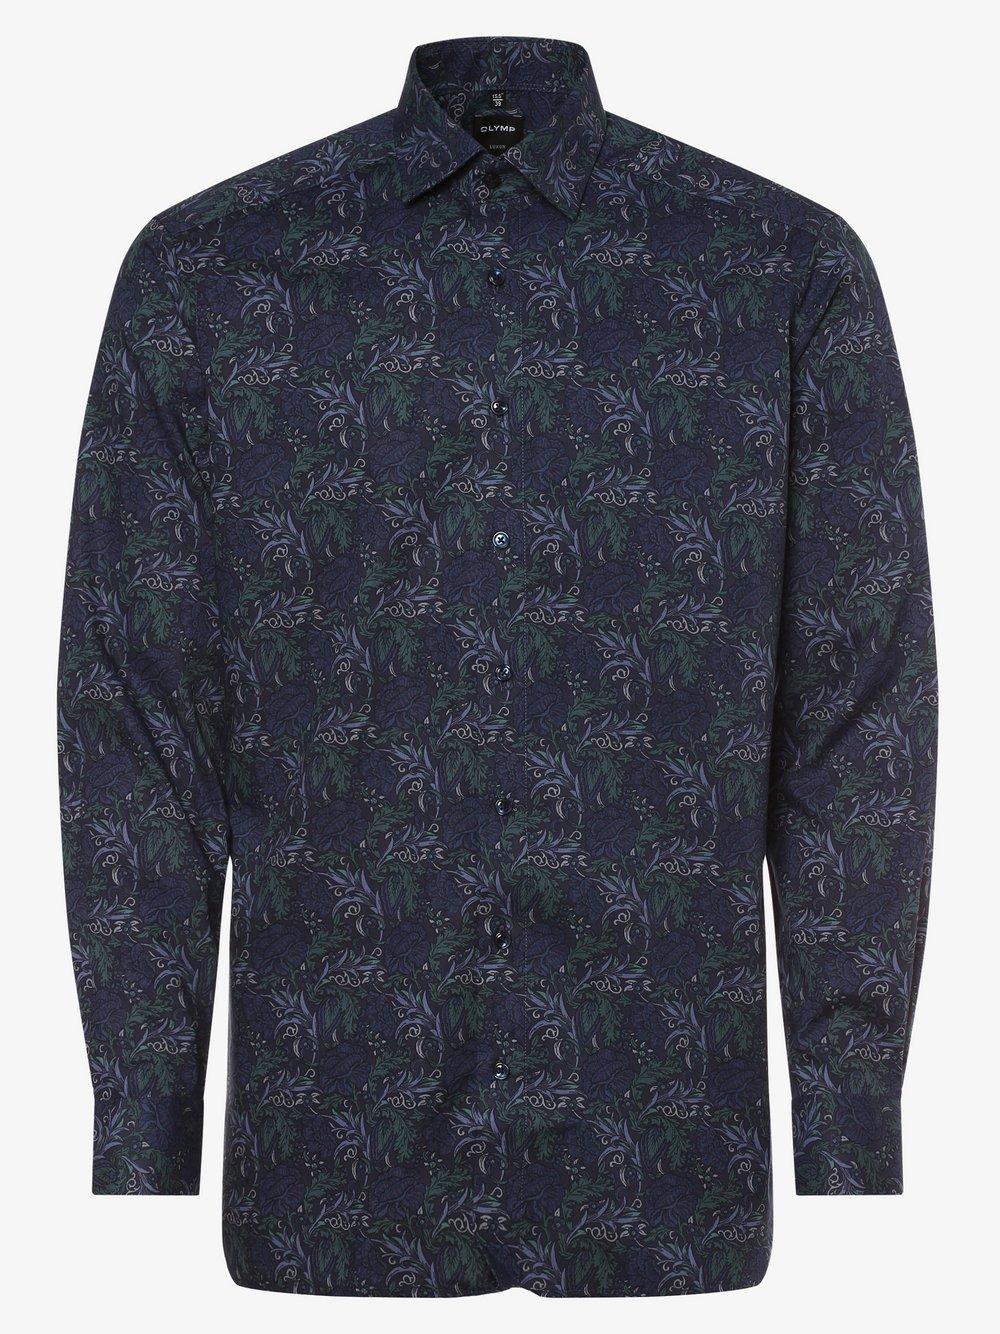 OLYMP Luxor modern Fit – Koszula męska – niewymagająca prasowania, niebieski Van Graaf 449018-0001